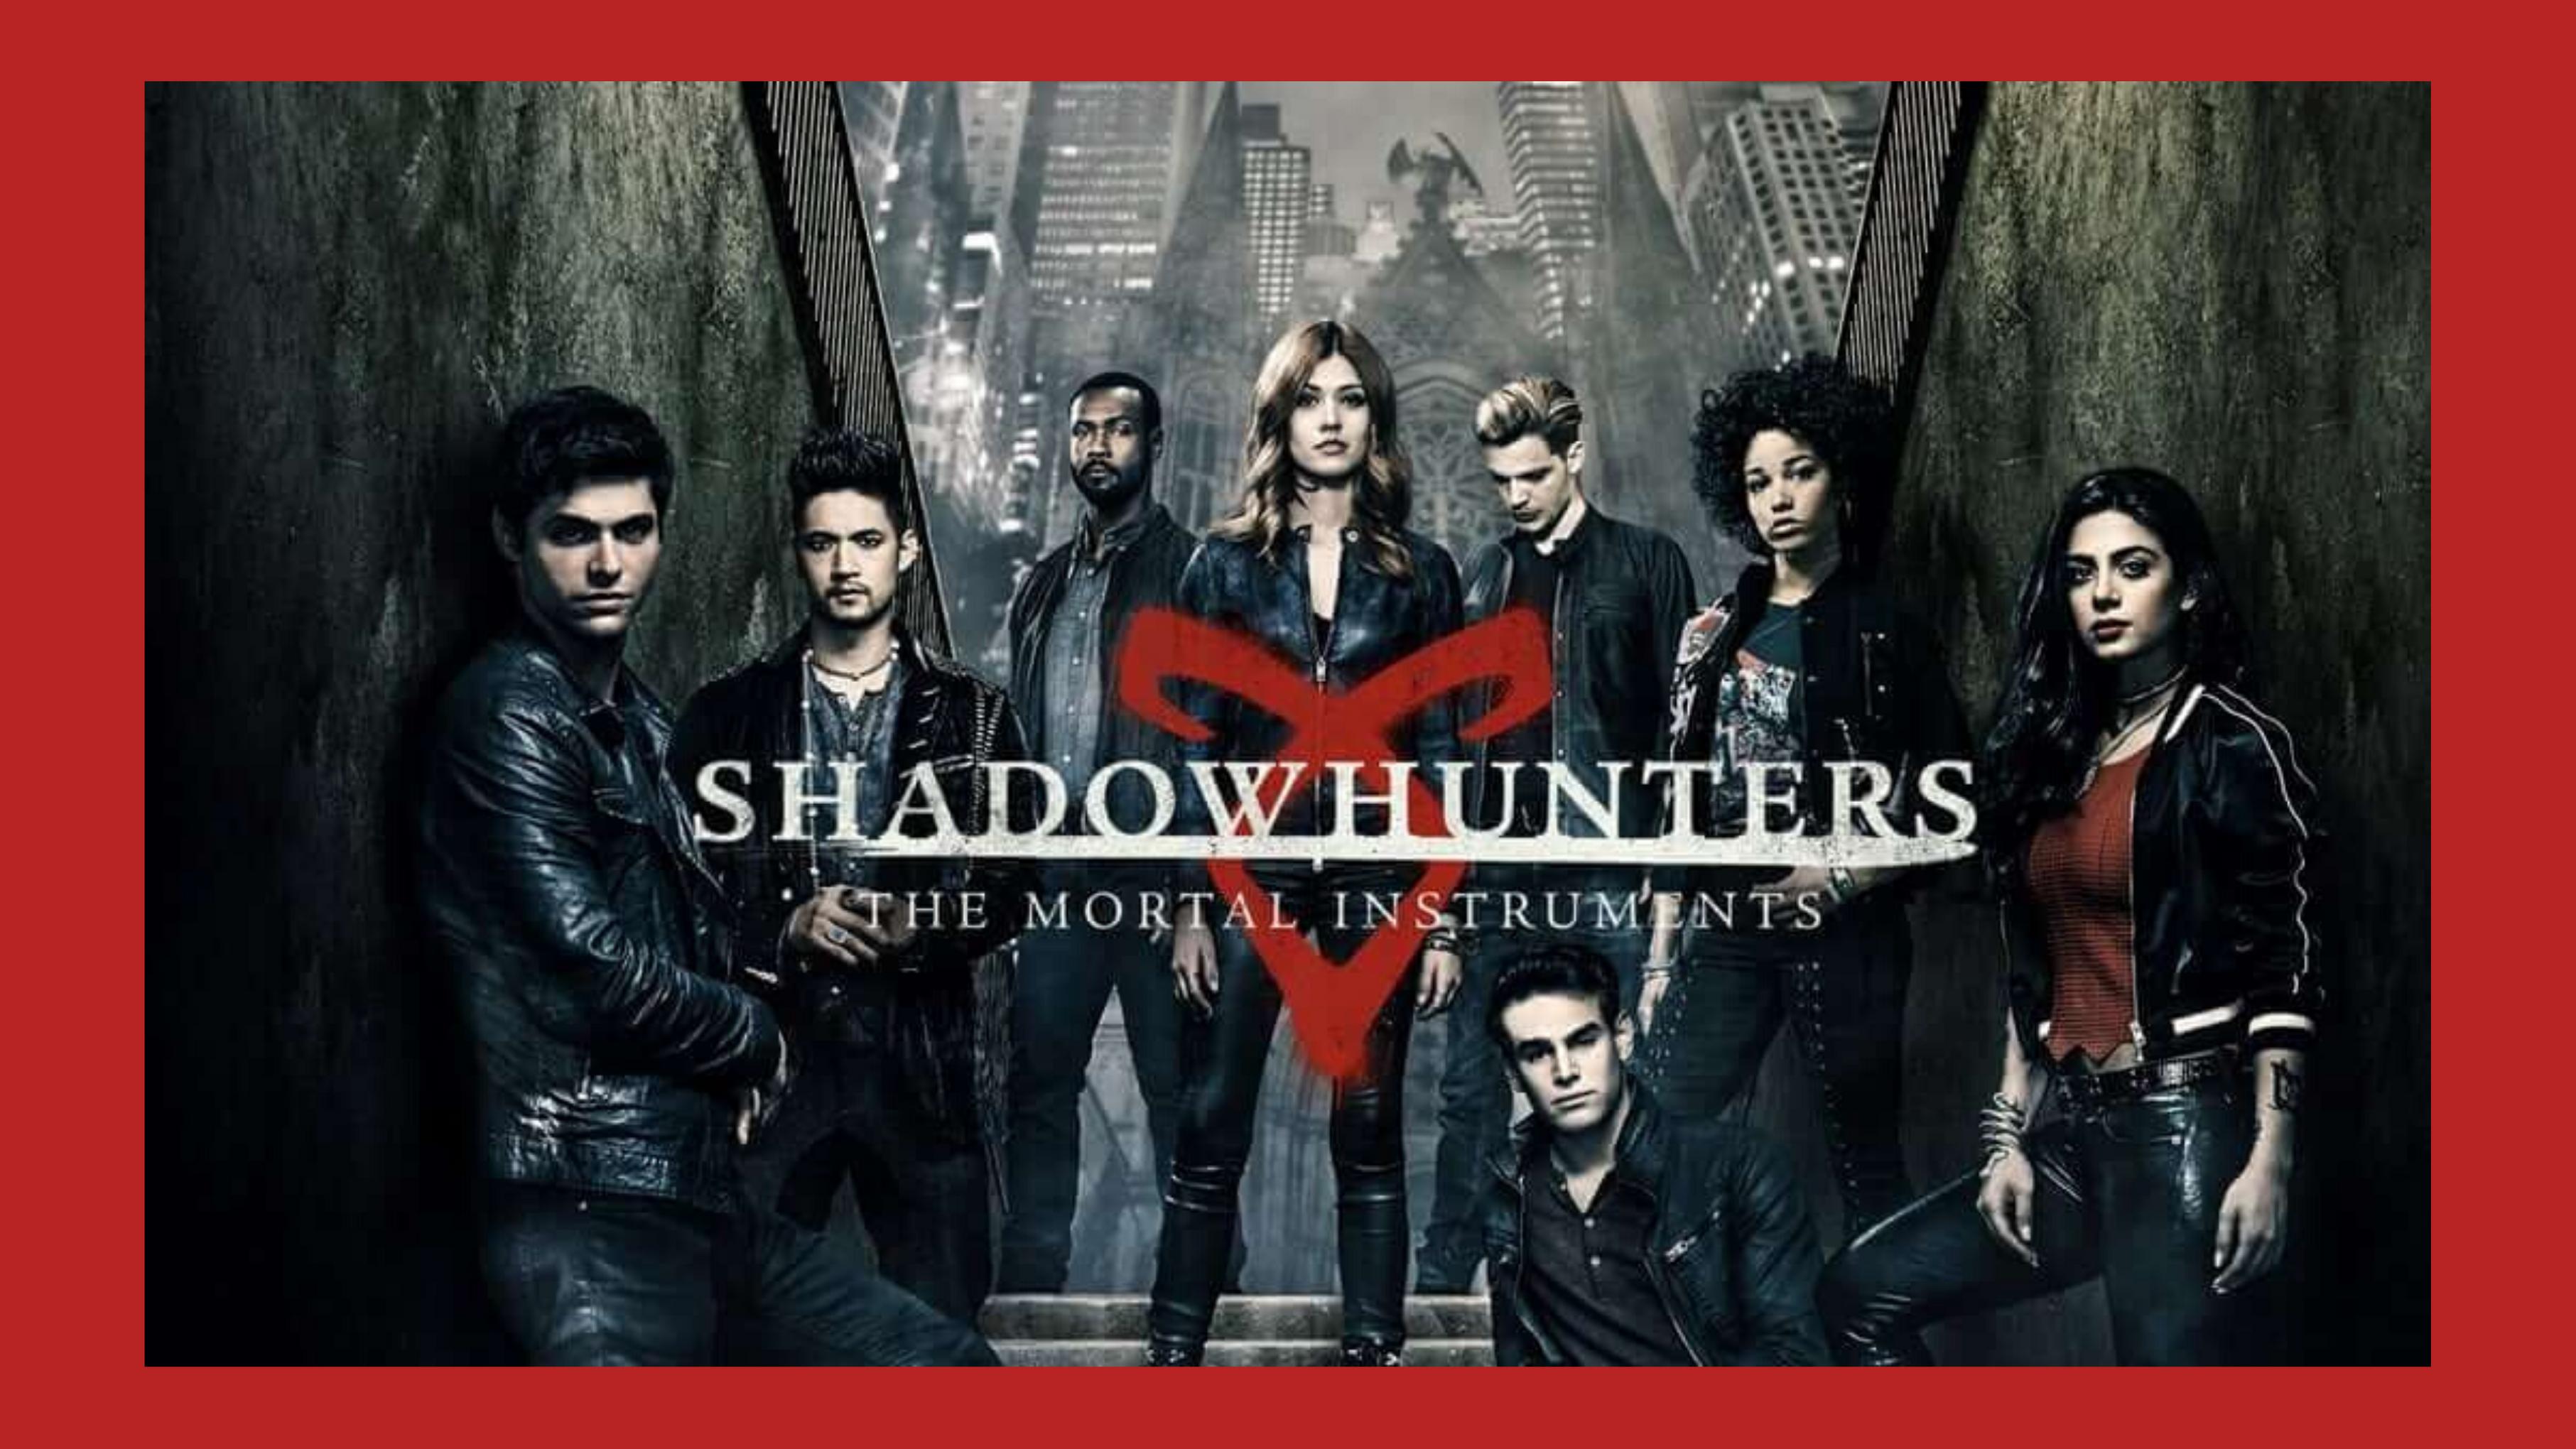 Shadowhunters, #Malec ja suuri oivallus fantasiasarjoista